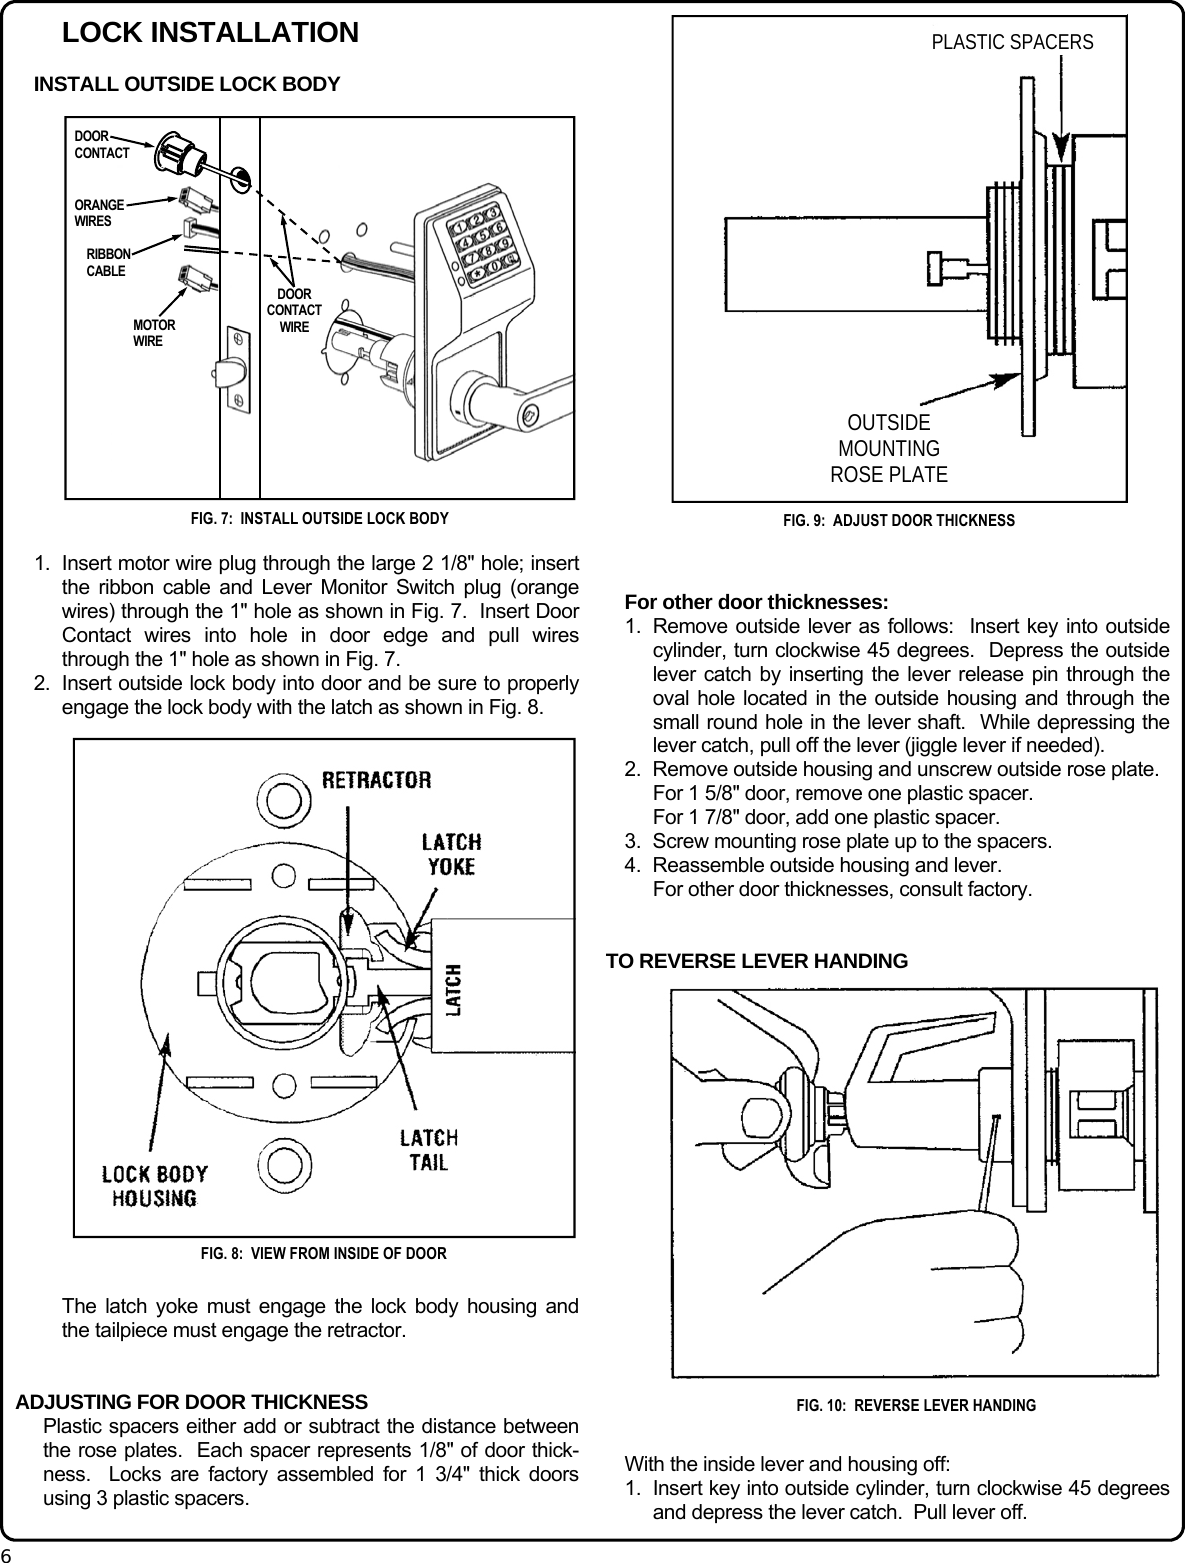 Alarm Lock PDL6200_DL6200_PDL8200_WI2024B.04_INST DL6200 ... on fire suppression diagram, prox switch diagram, alarm circuit diagram, alarm wiring circuit, alarm wiring guide, car alarm diagram, alarm panel wiring, alarm valve, alarm switch diagram, vehicle alarm system diagram, alarm installation diagram, alarm cable, alarm horn, 4 wire proximity diagram, alarm wiring tools, alarm wiring symbols,